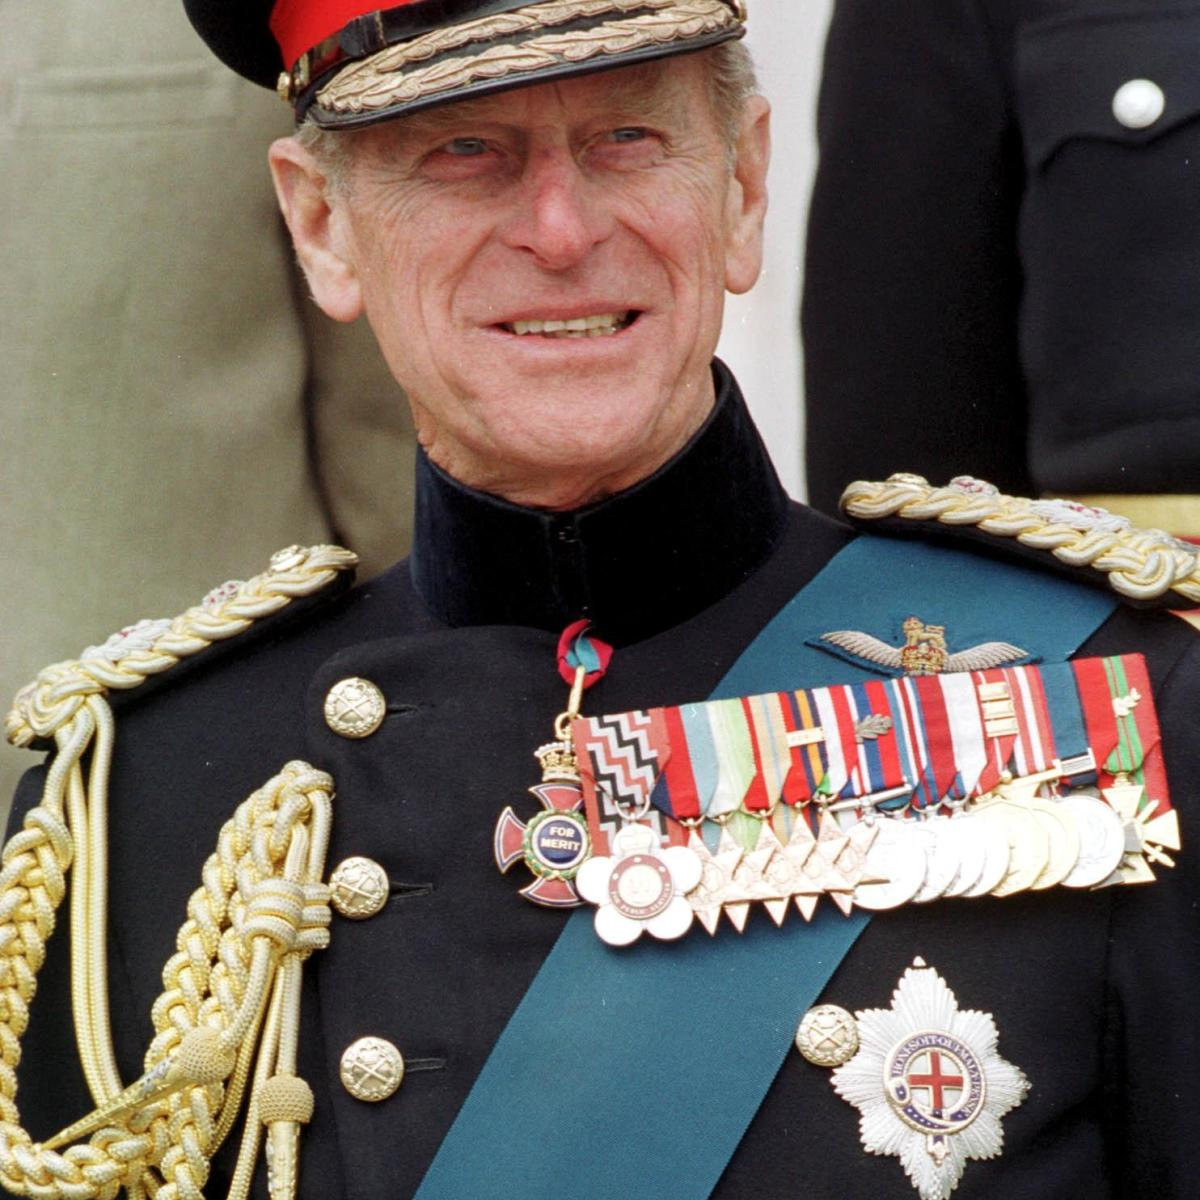 Prince Philip Grew Up With 4 Incredible Siblings — Meet the Duke of Edinburgh's Sisters